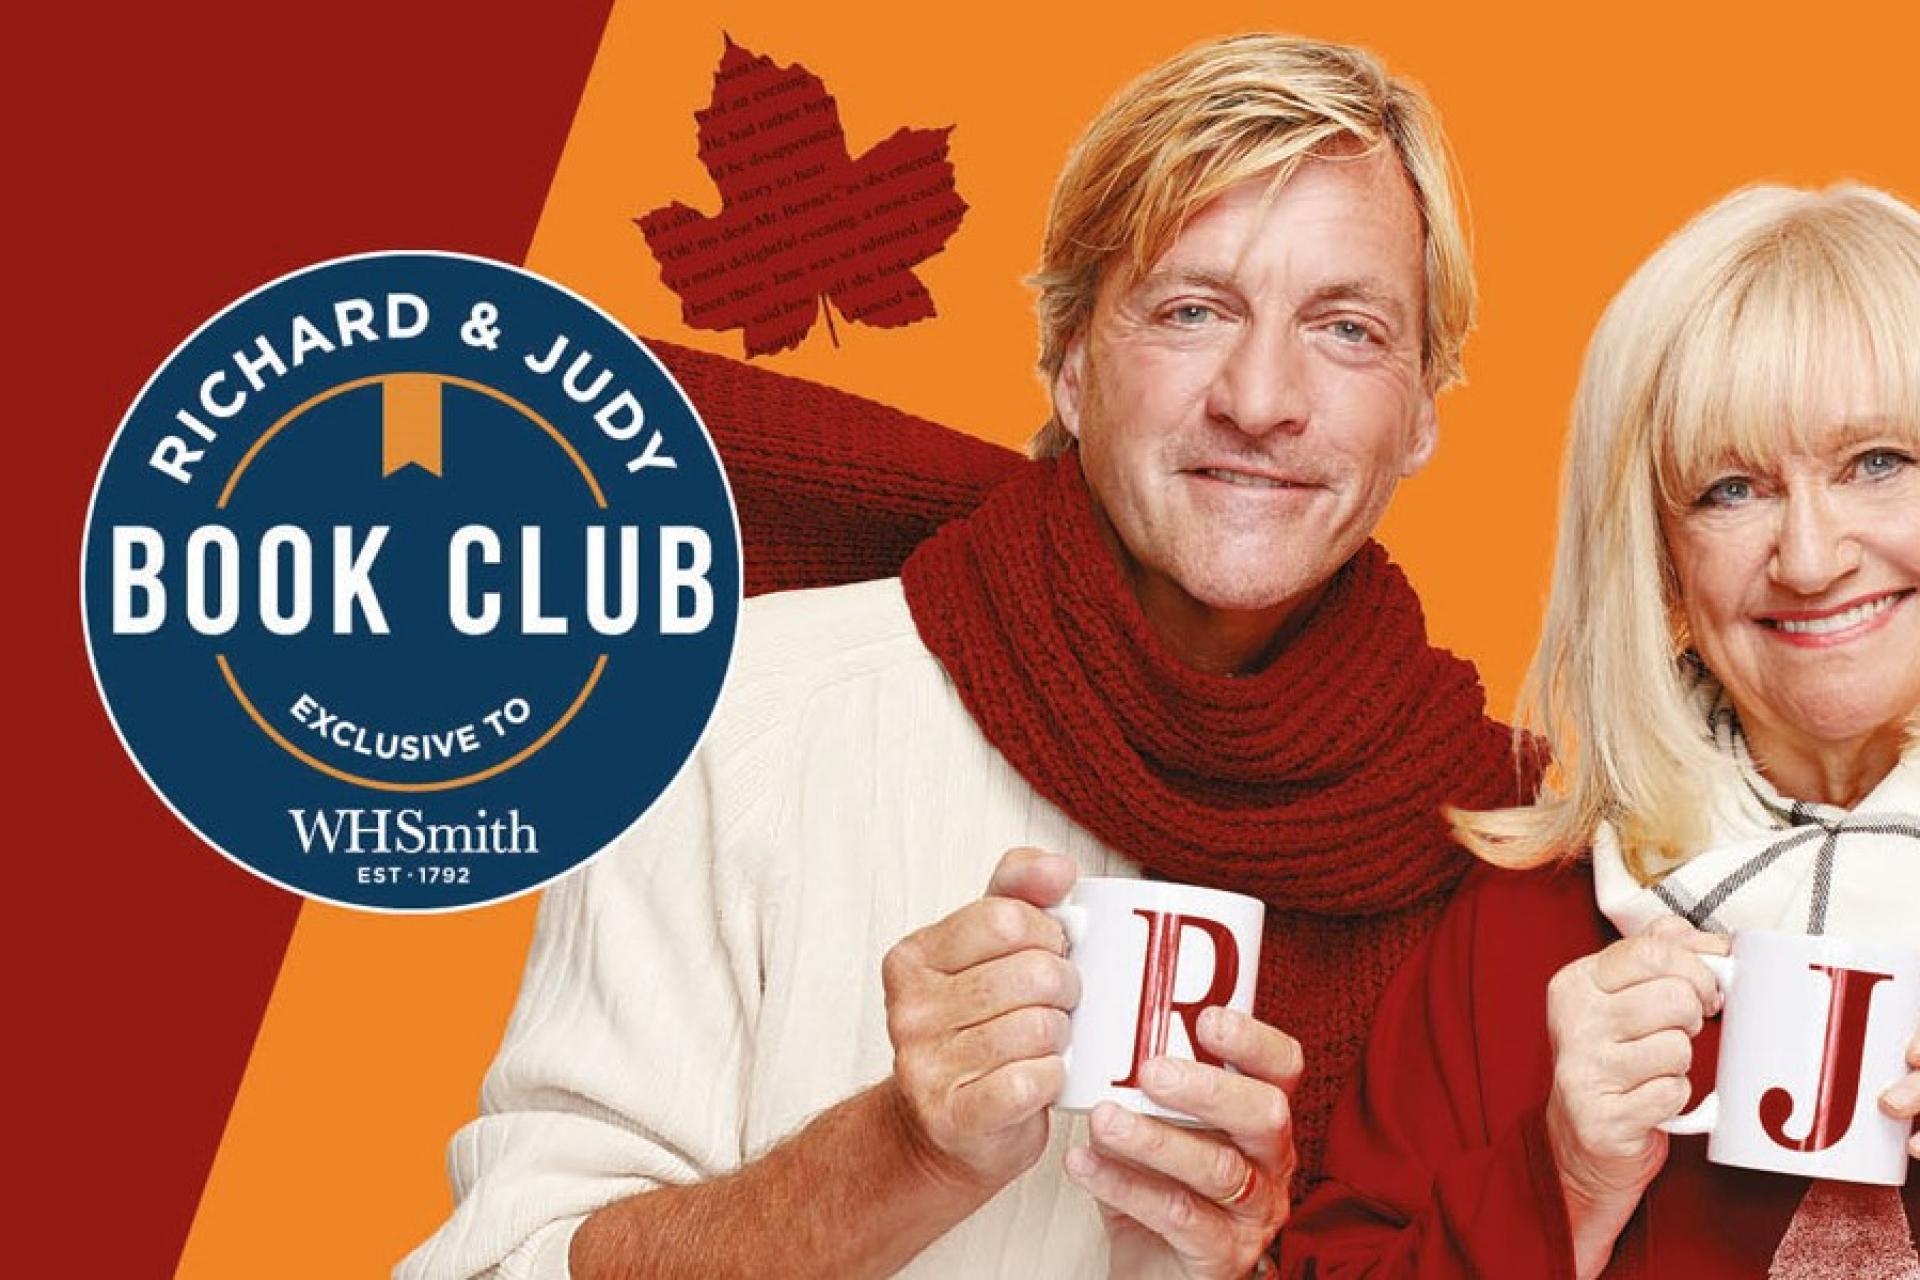 Richard & Judy Book Club Autumn Picks Revealed